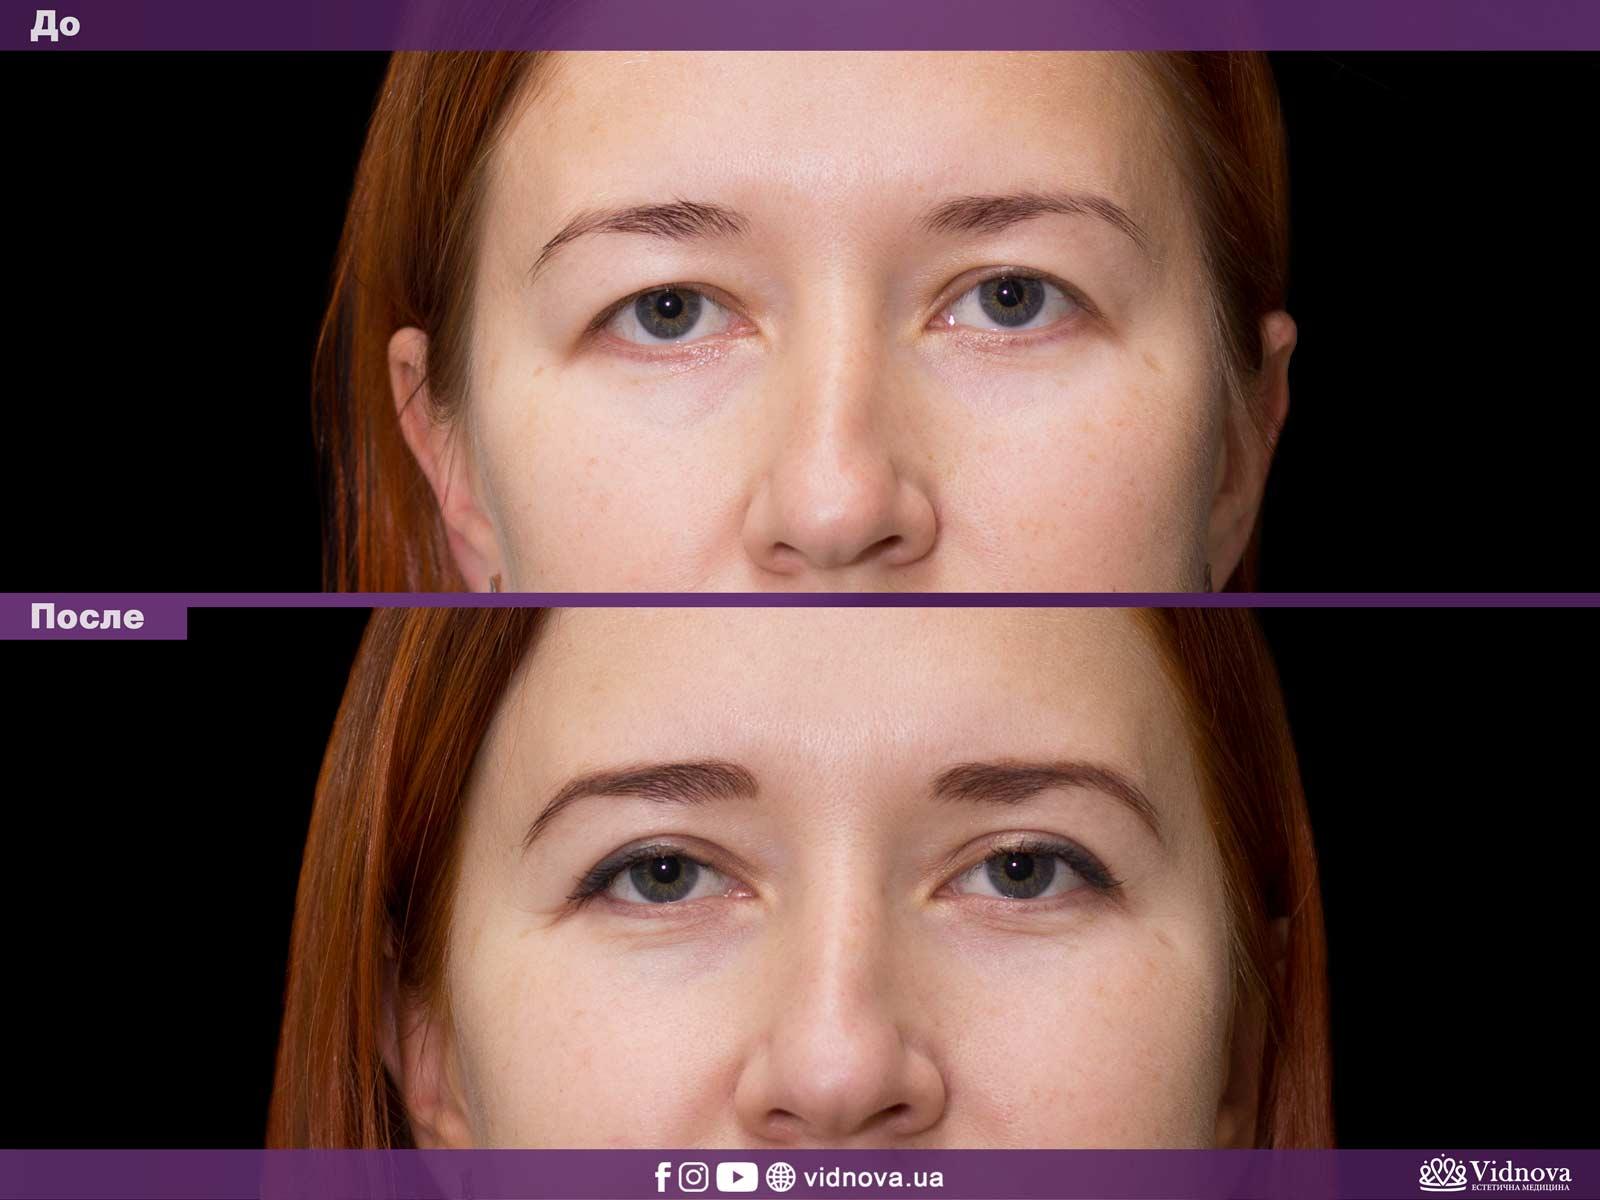 Блефаропластика: Фото До и После - Пример №34-1 - Клиника Vidnova